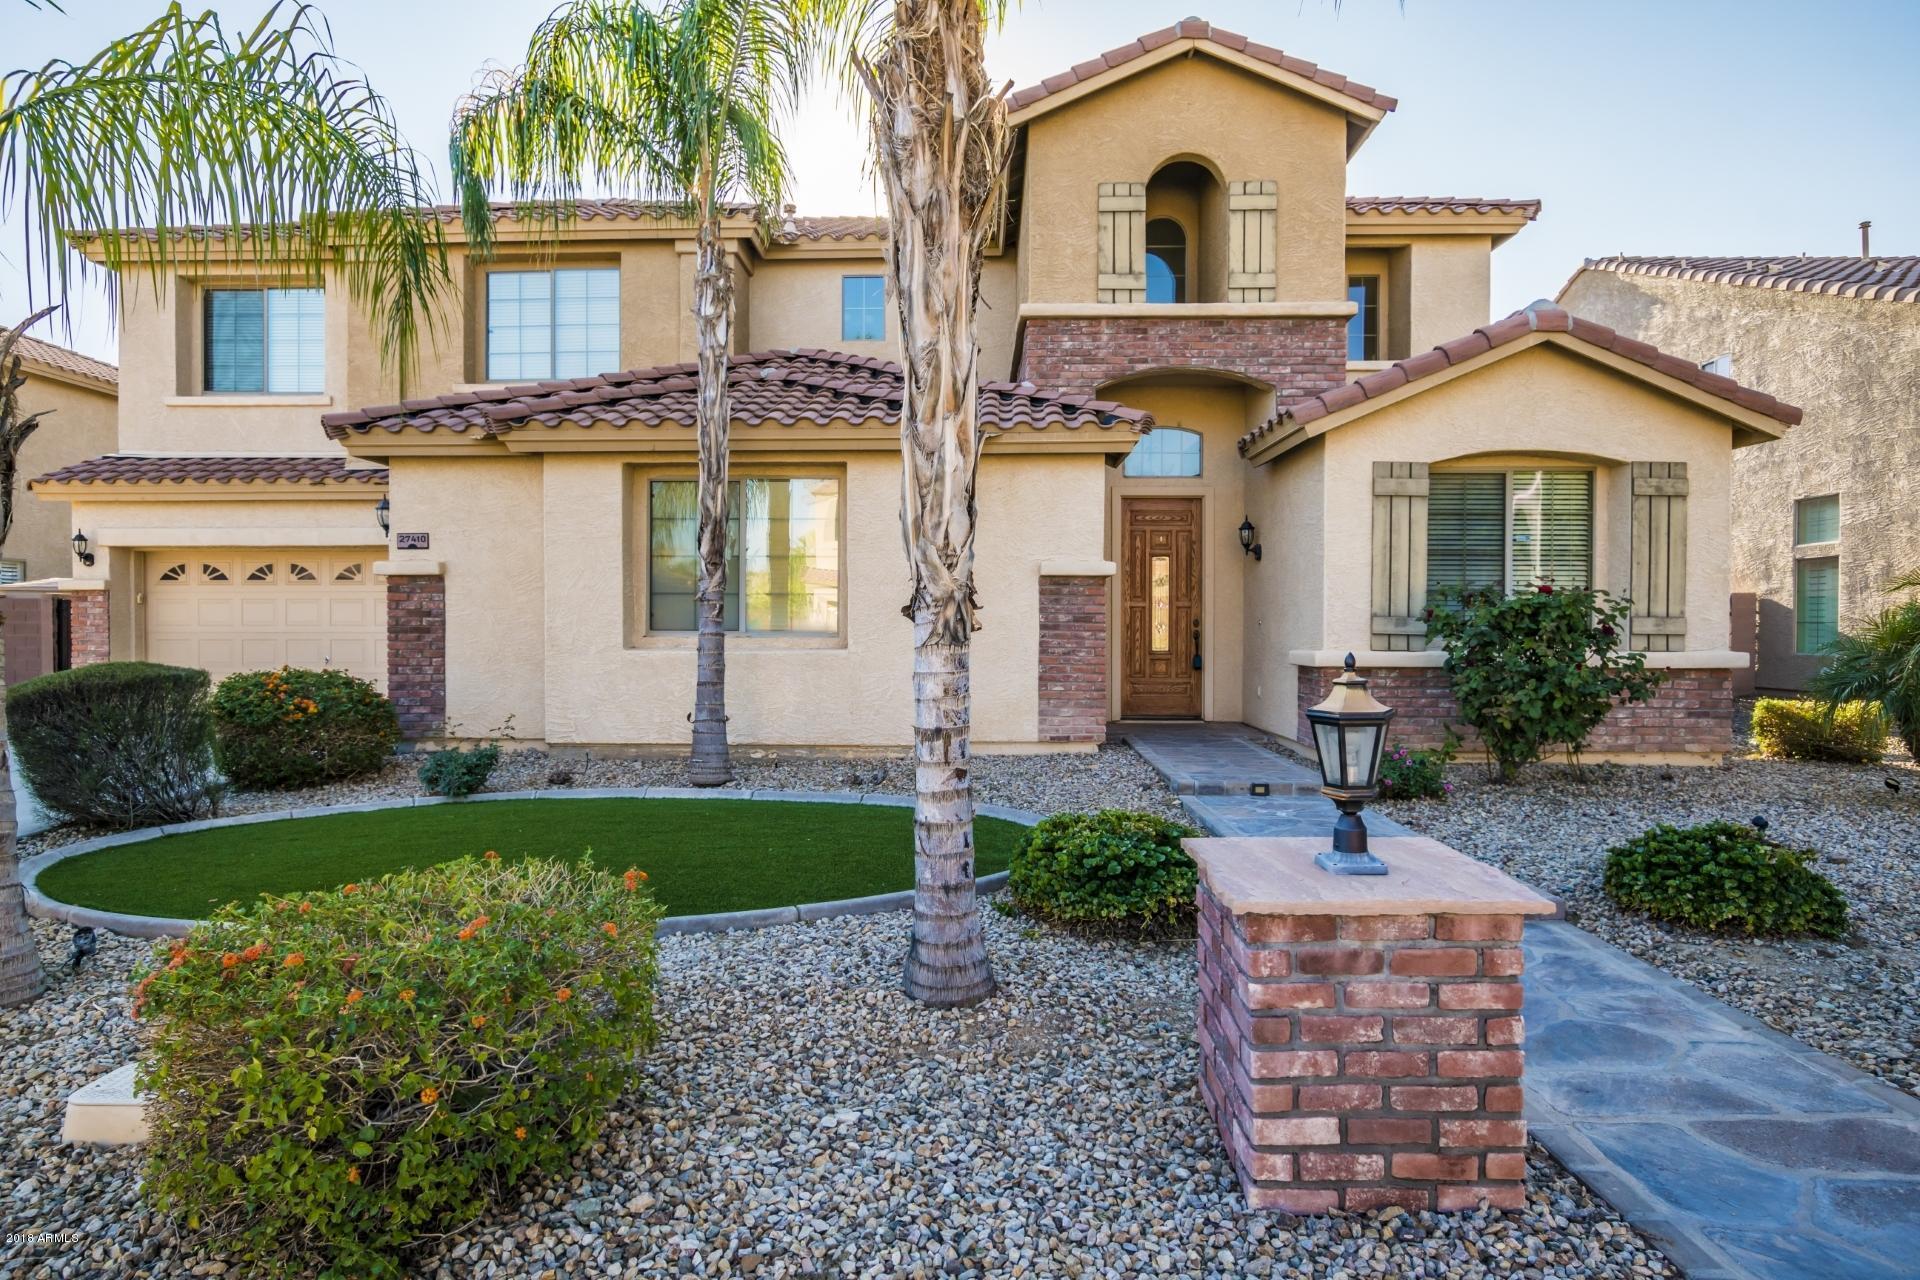 27410 N GIDIYUP Trail, Phoenix, AZ 85085 - Jan Leighton